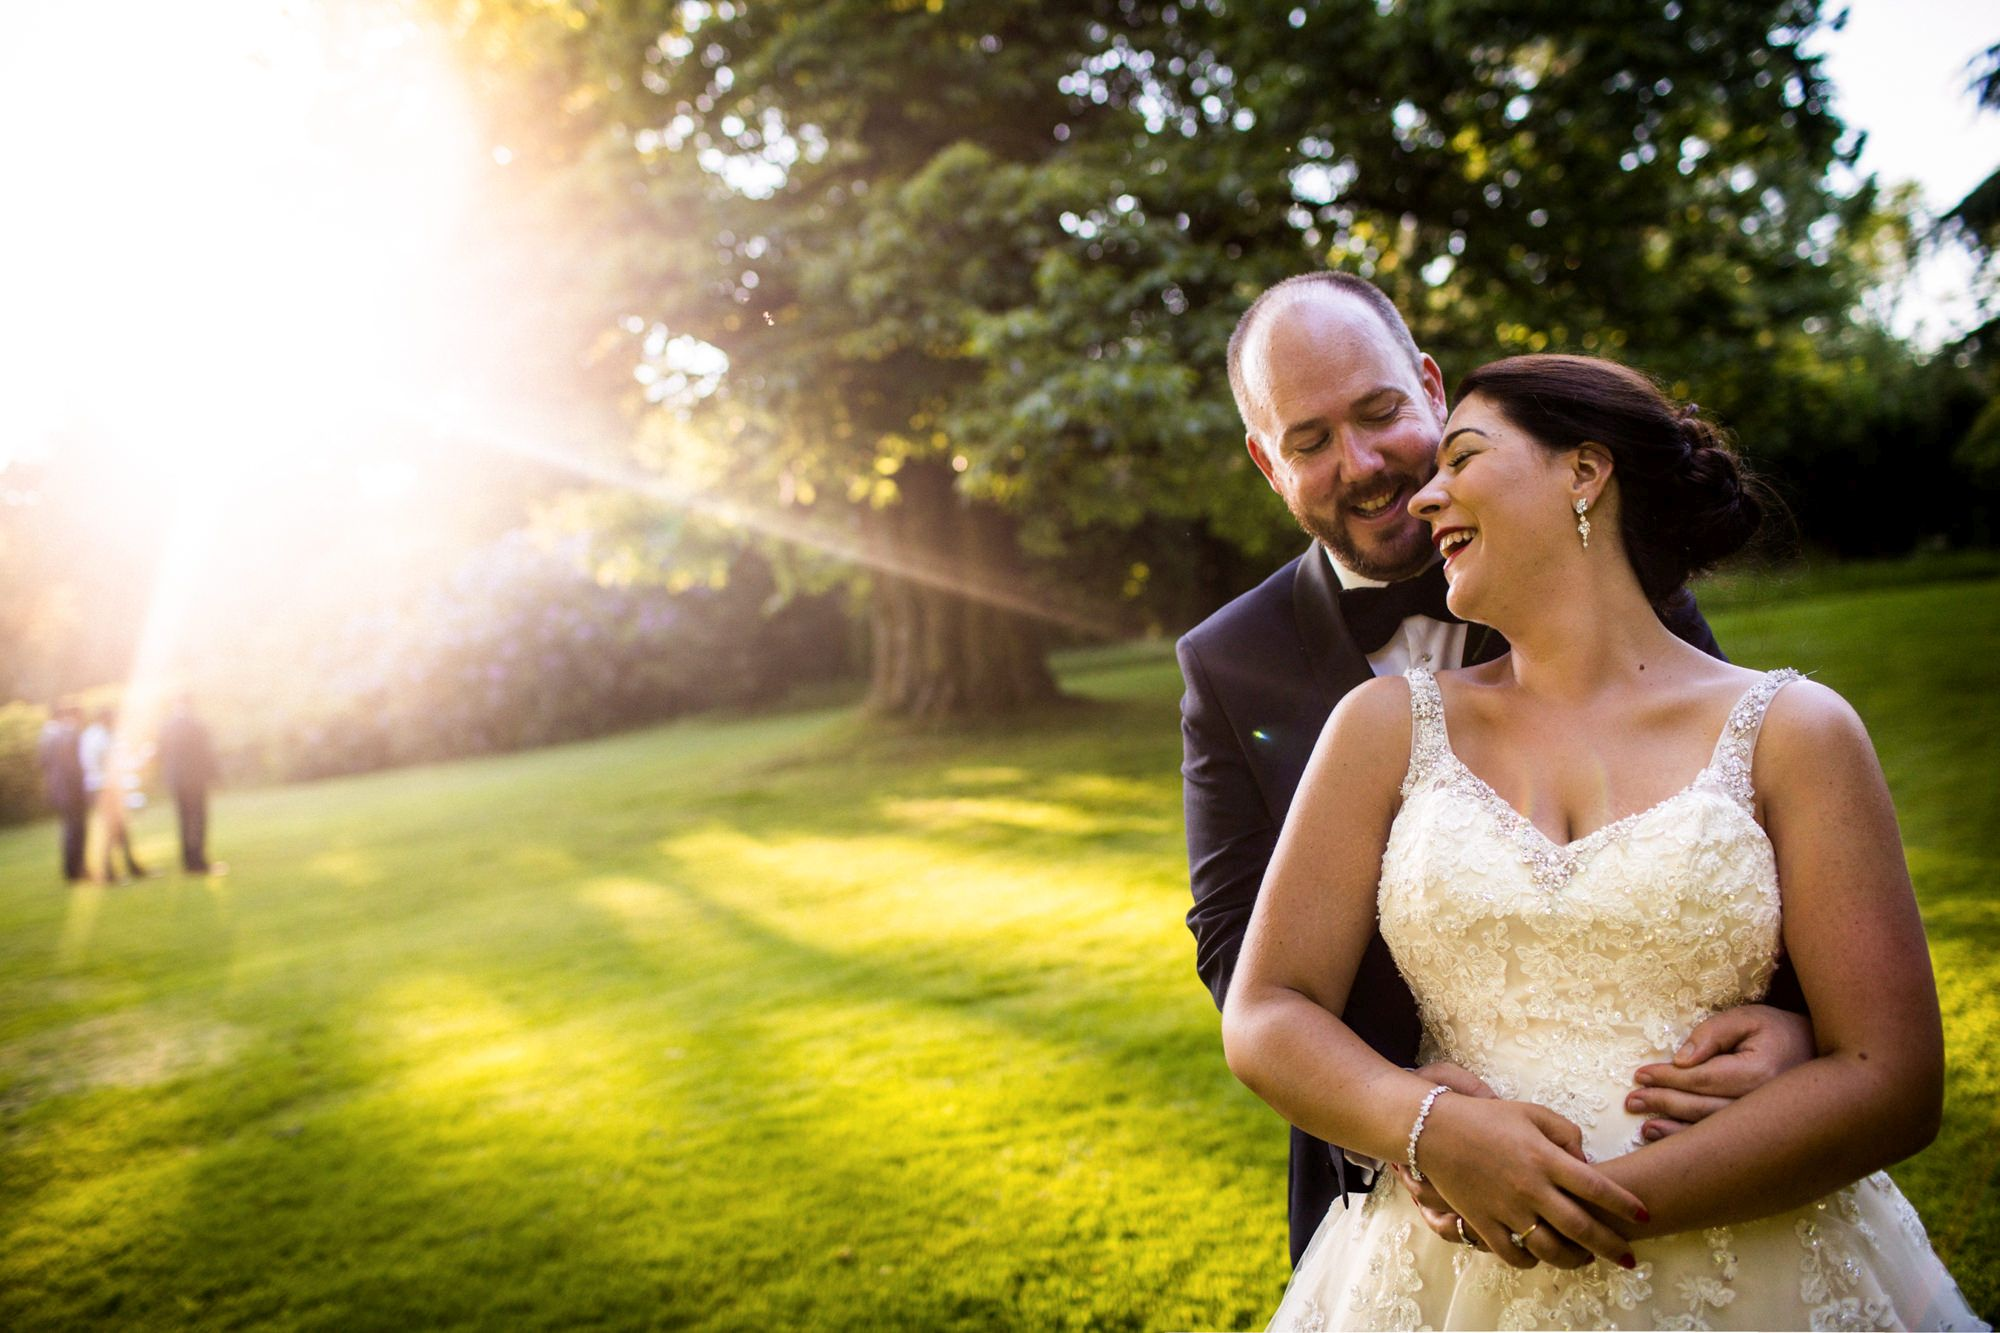 huntsham court wedding with bride and groom